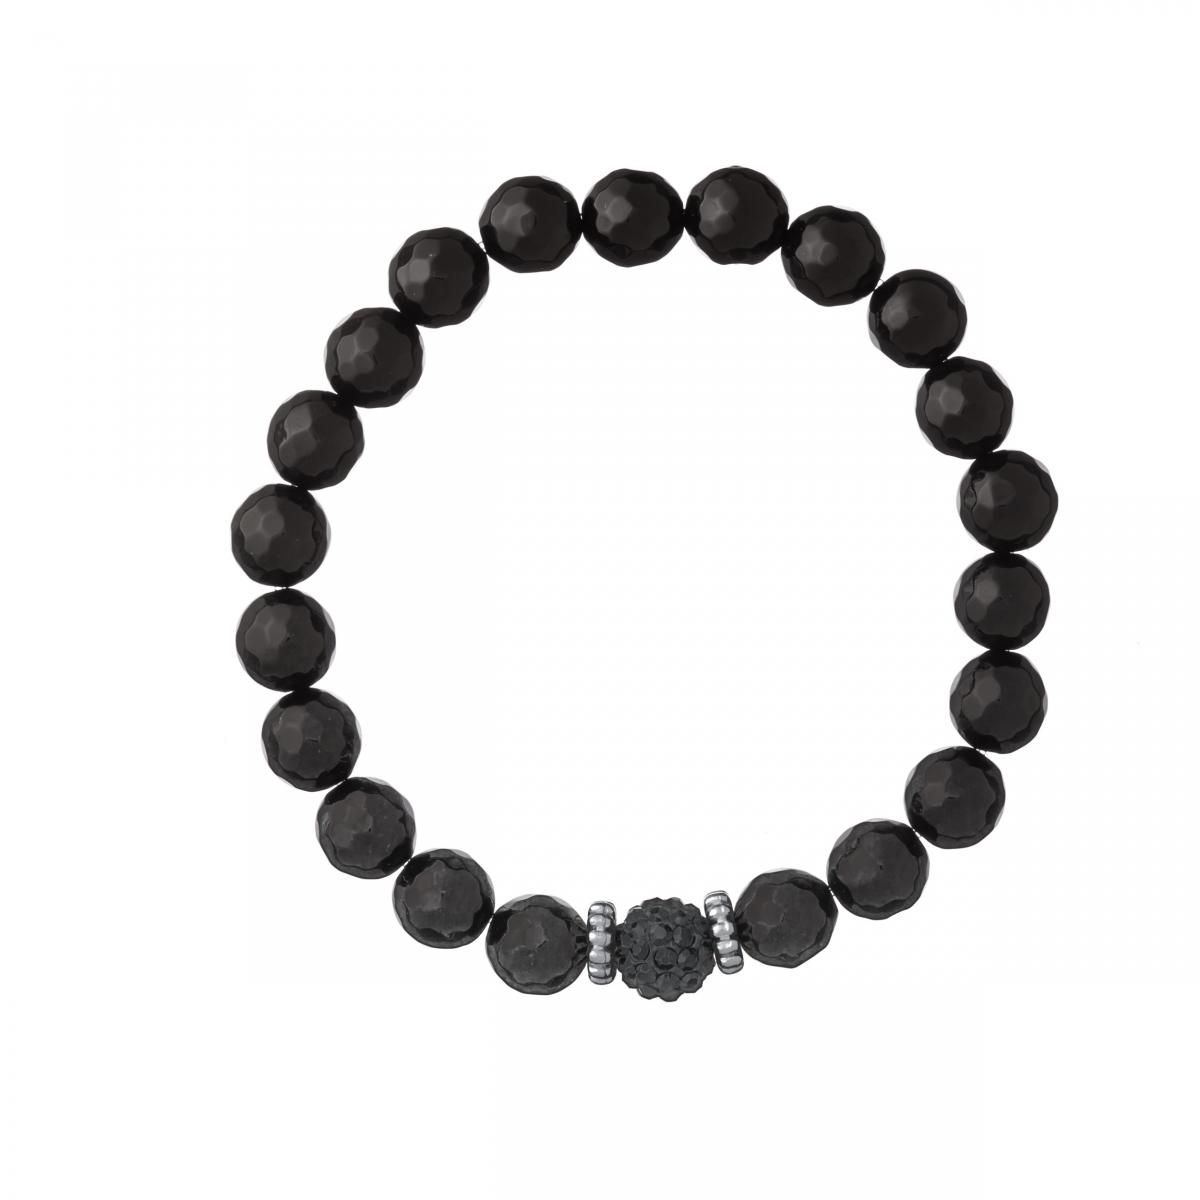 Náramok Mineral Black Facet Onyx Ball Crystals Silver